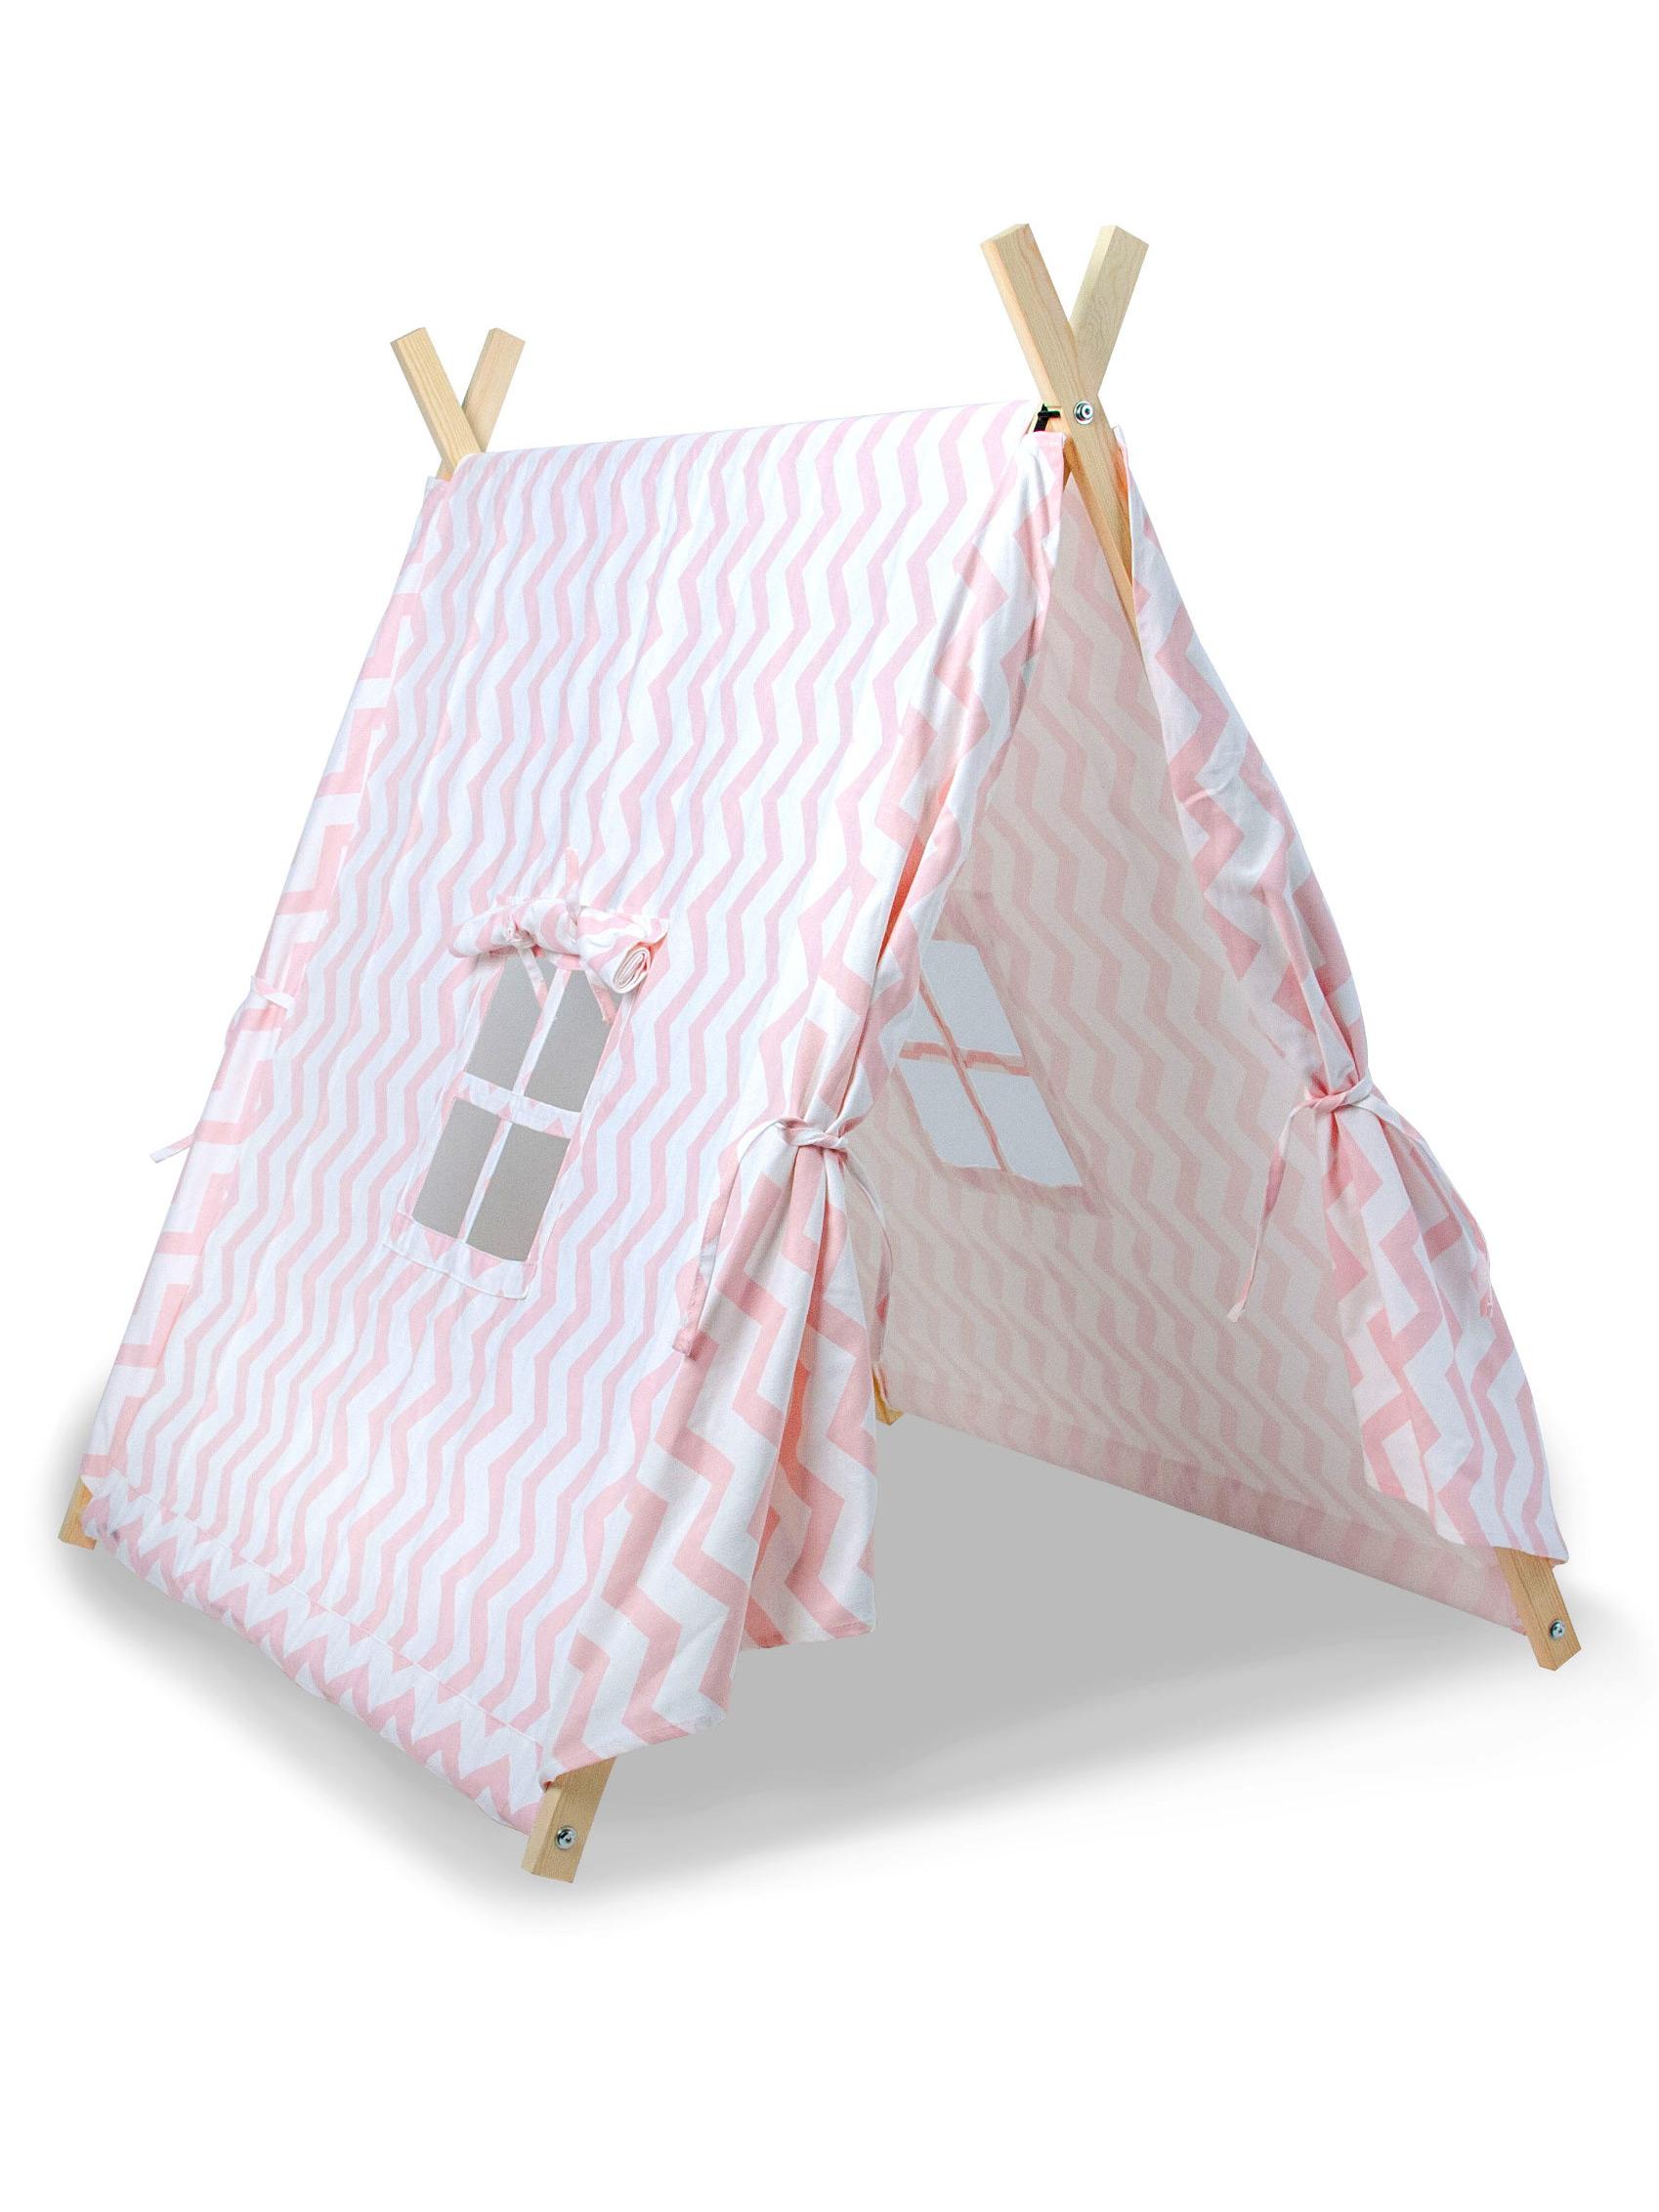 tente canadienne enfant rose deguise toi achat de decoration animation. Black Bedroom Furniture Sets. Home Design Ideas